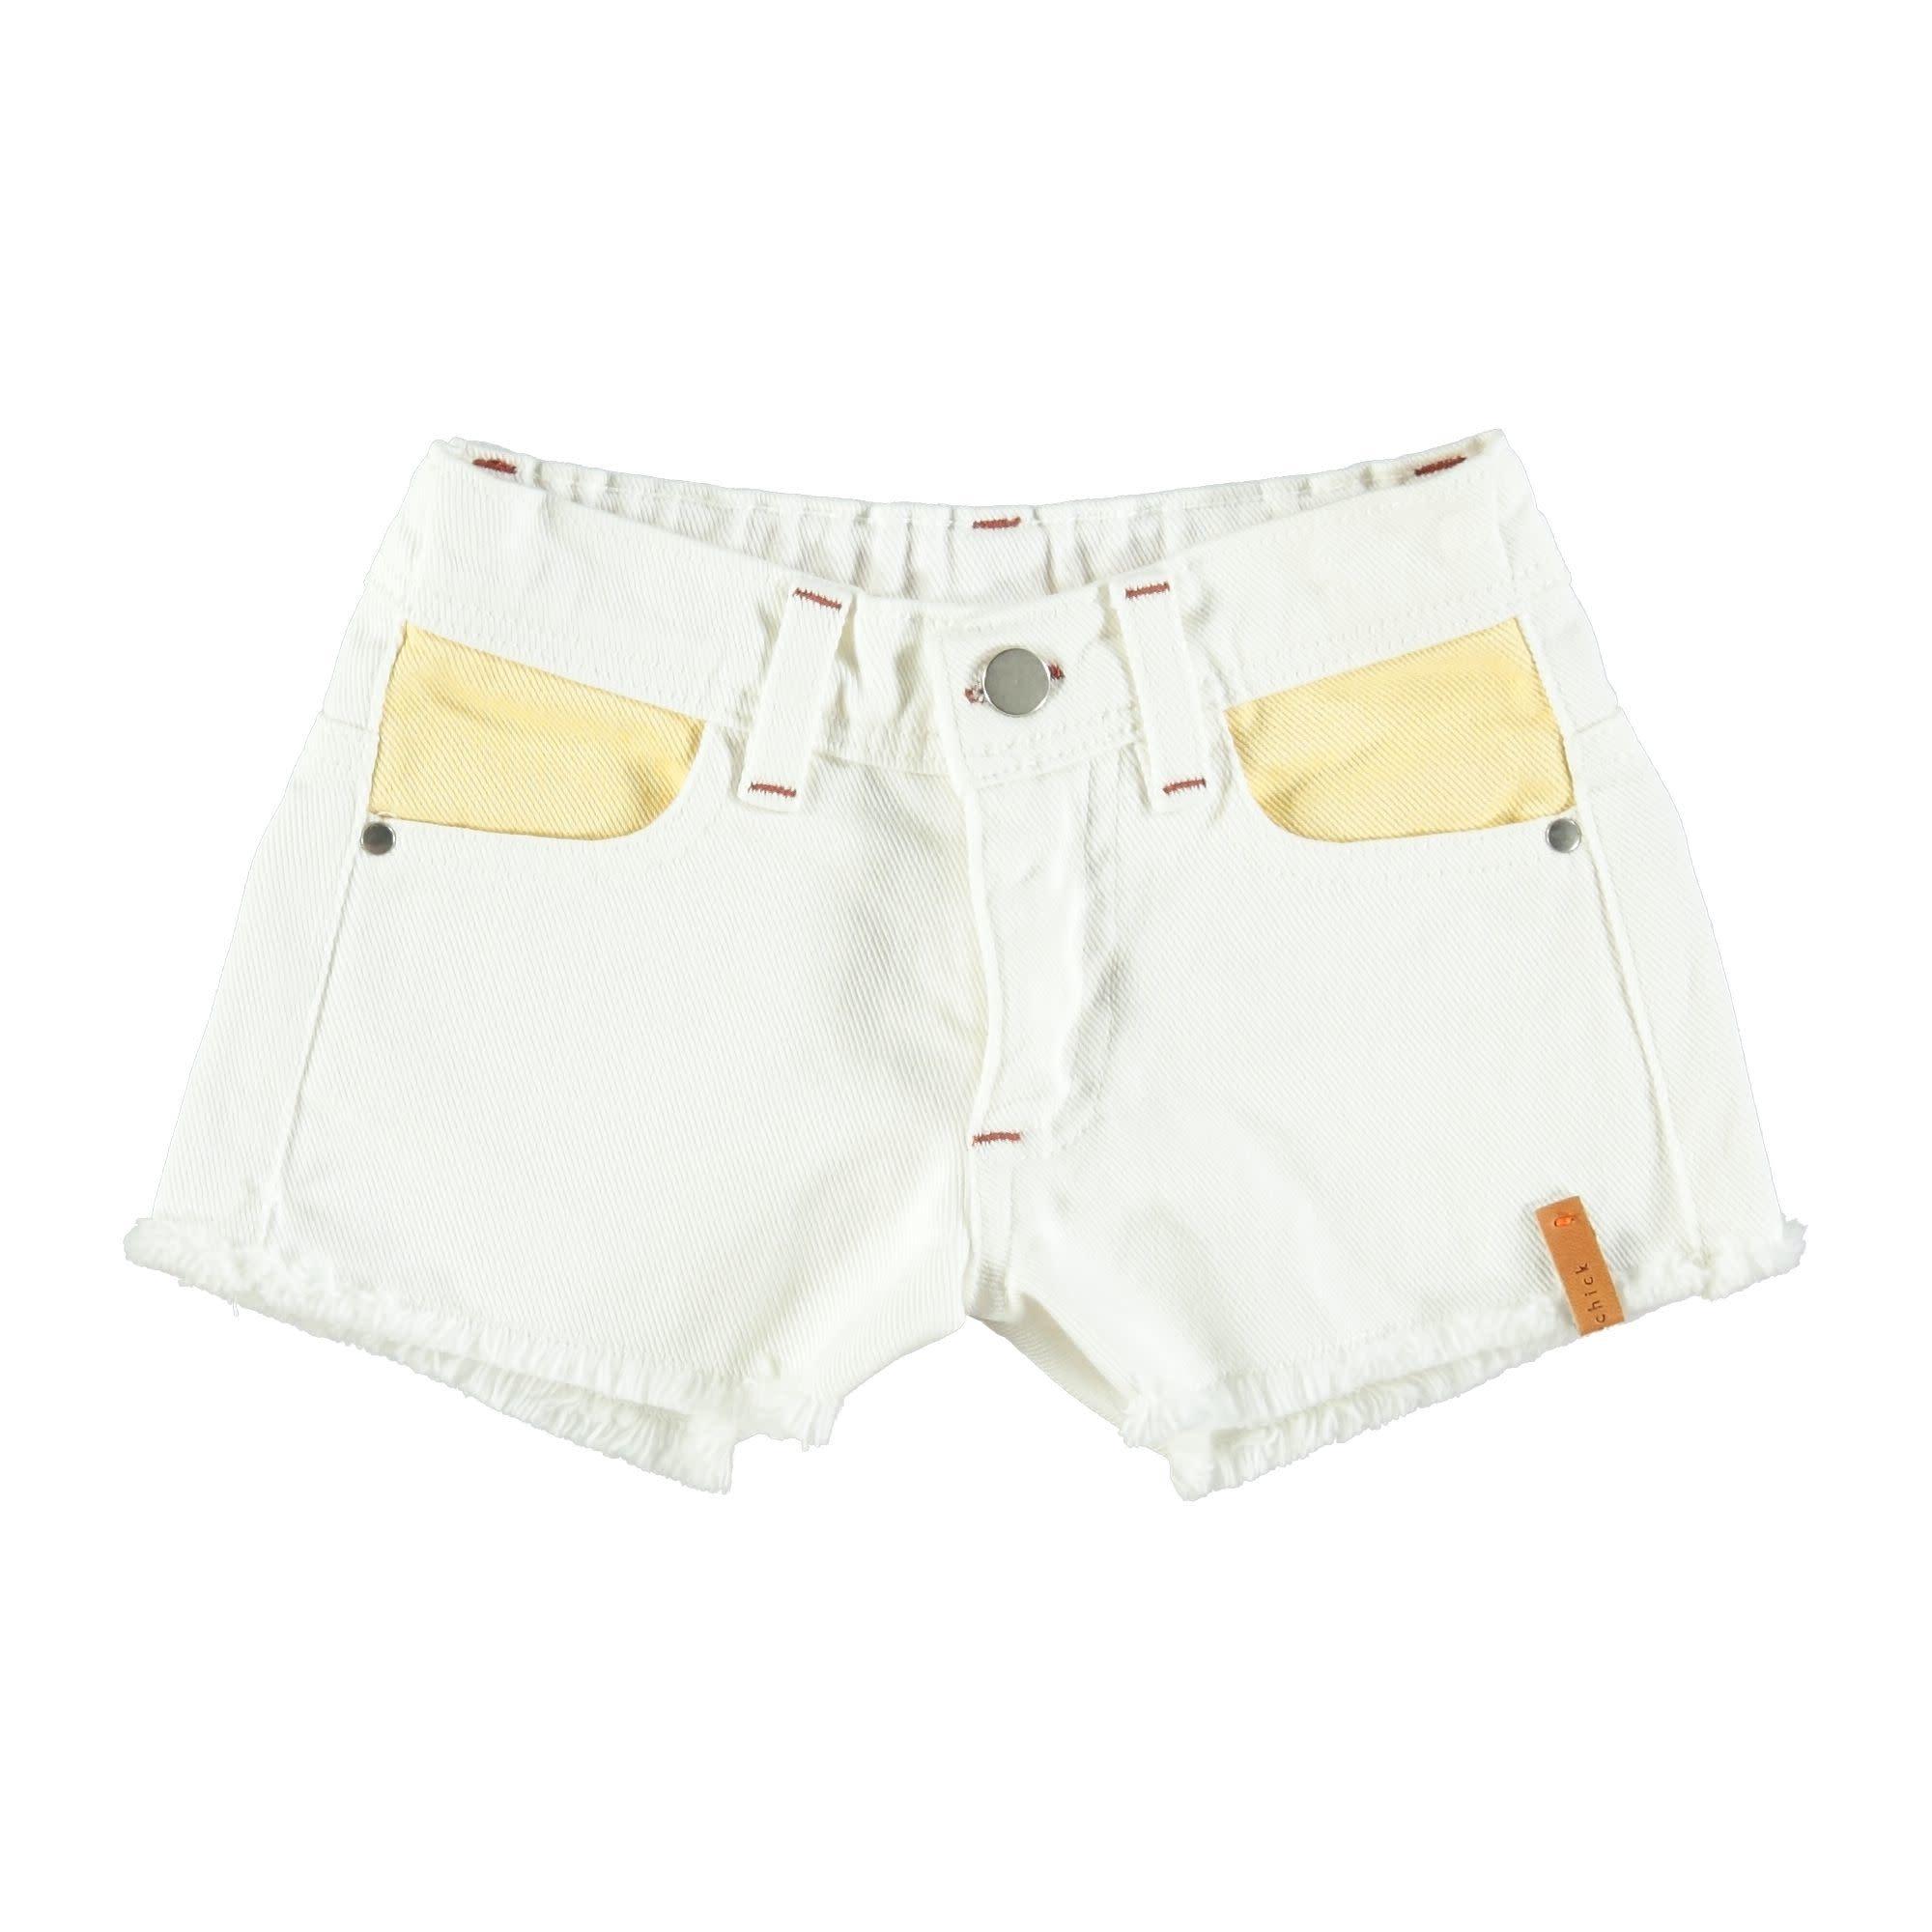 Piupiuchick Piupiuchick - Tricolor shorts off white yellow pink green